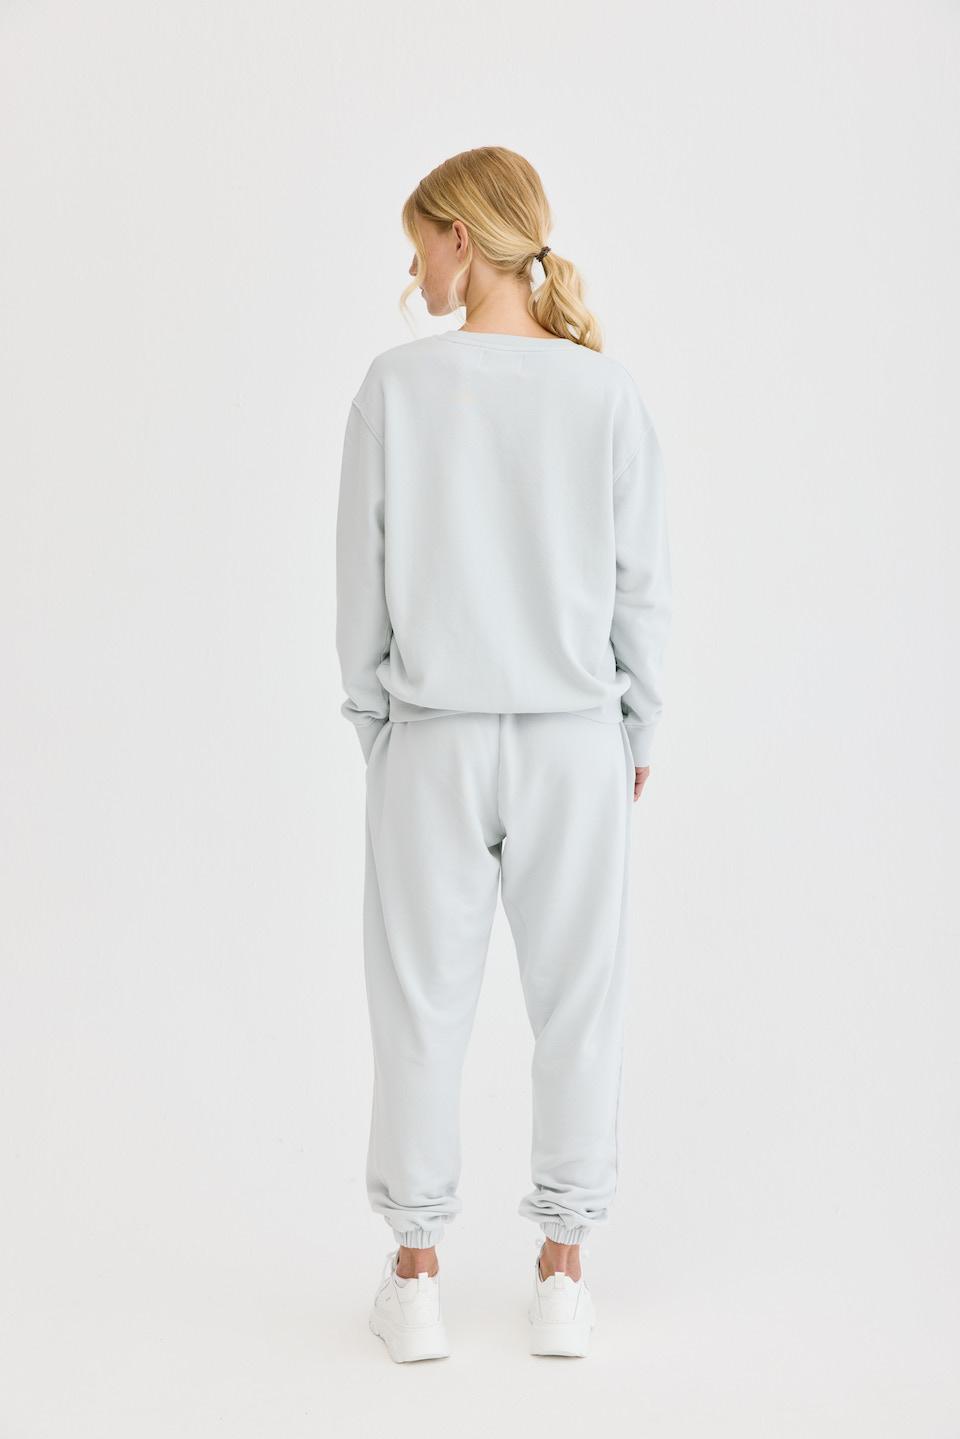 CPH Sweat 4 org. cotton light grey - alternative 1